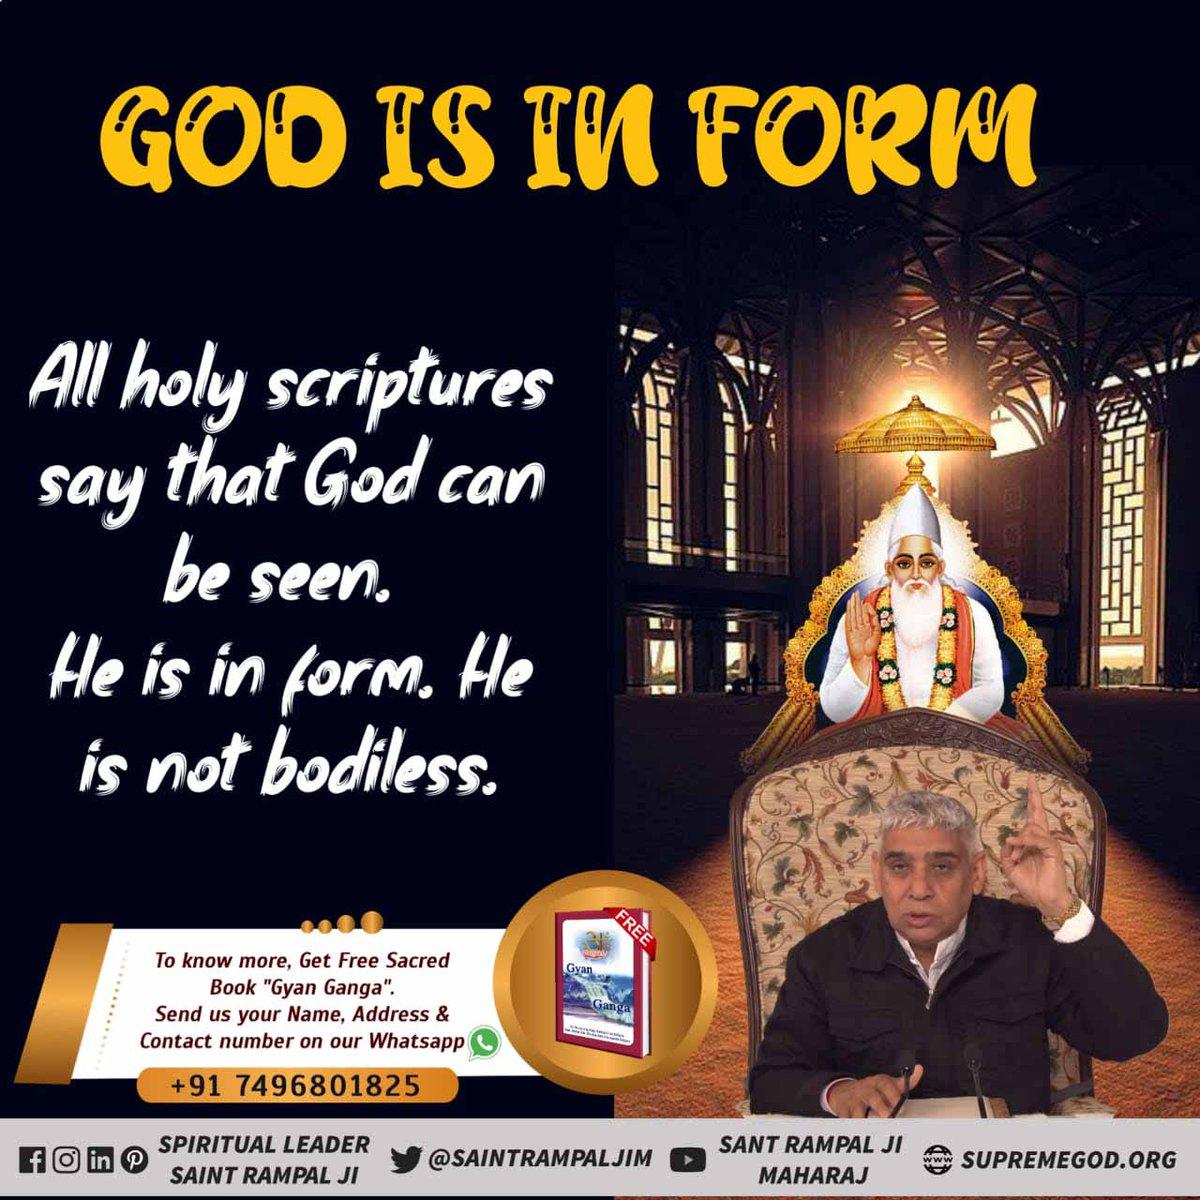 #अल्लाह_साकार_है #SundayMotivation #SundayMorning #SundayFunday God is in form. All holy  scriptures say that Allah can be seen. @SaintRampalJiM Allah Kabir